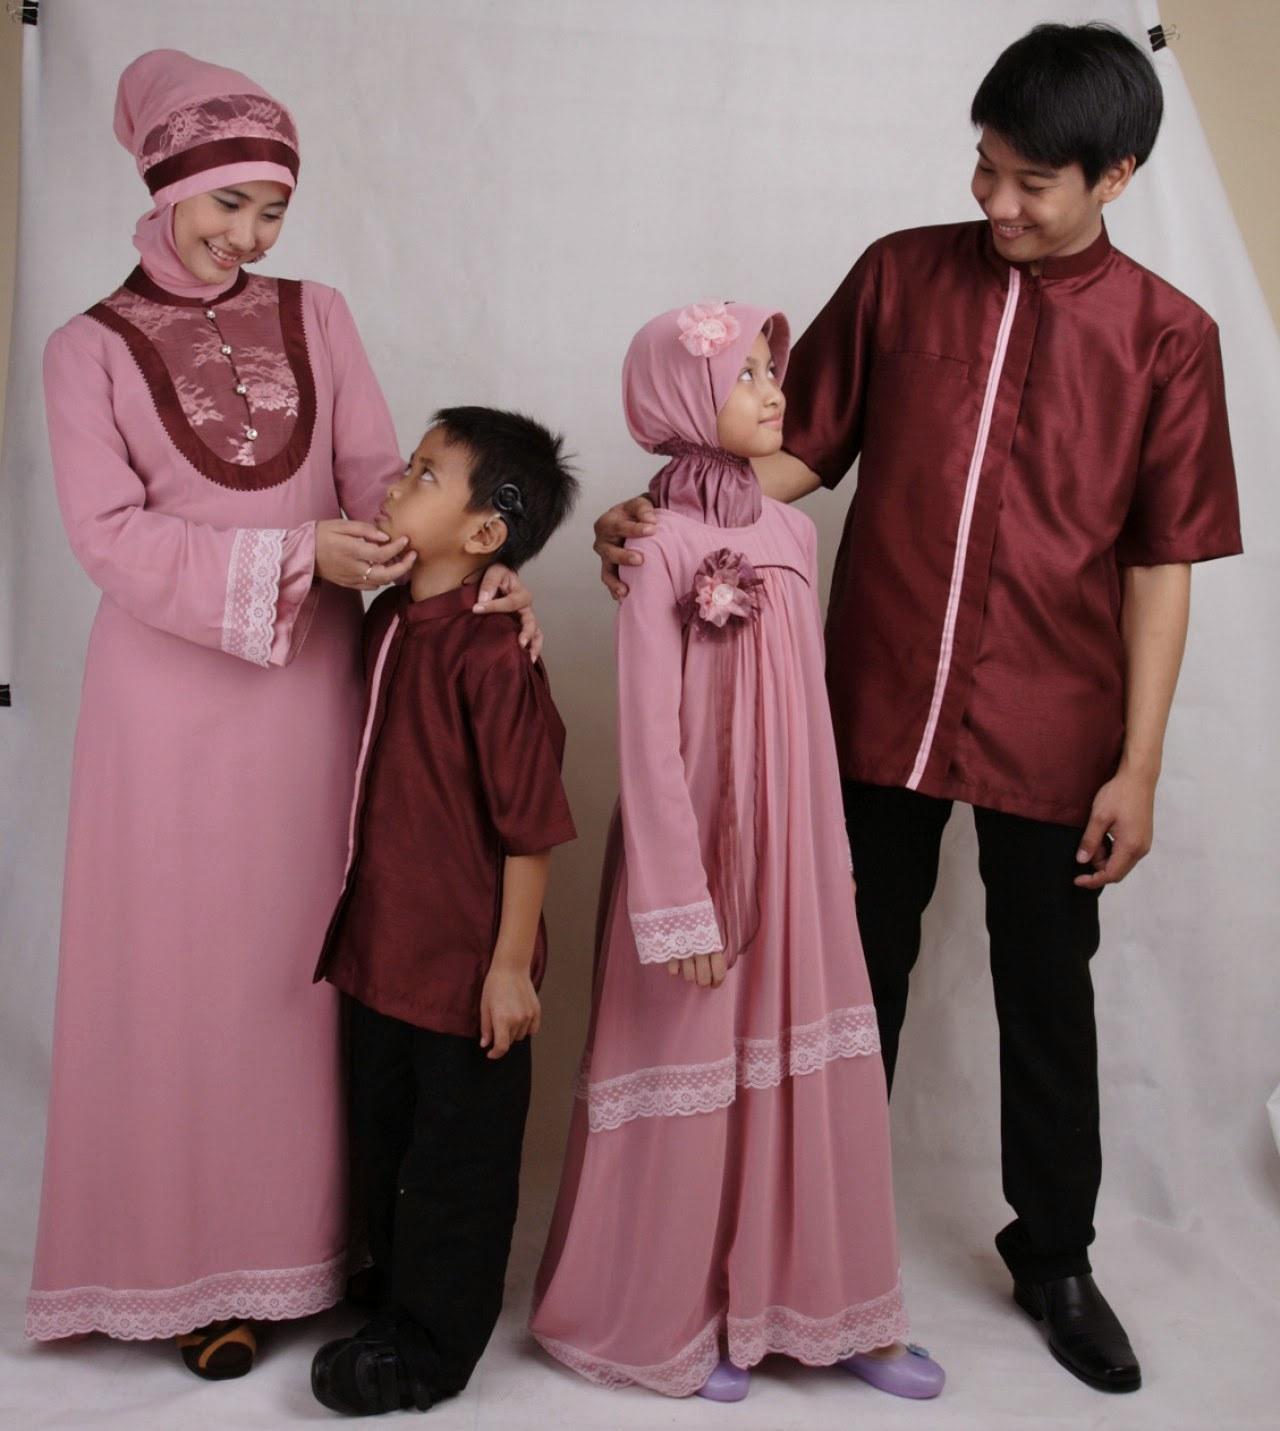 Inspirasi Model Baju Lebaran Keluarga H9d9 Model Baju Keluarga Muslim Seragam Kembar Terbaru 2018